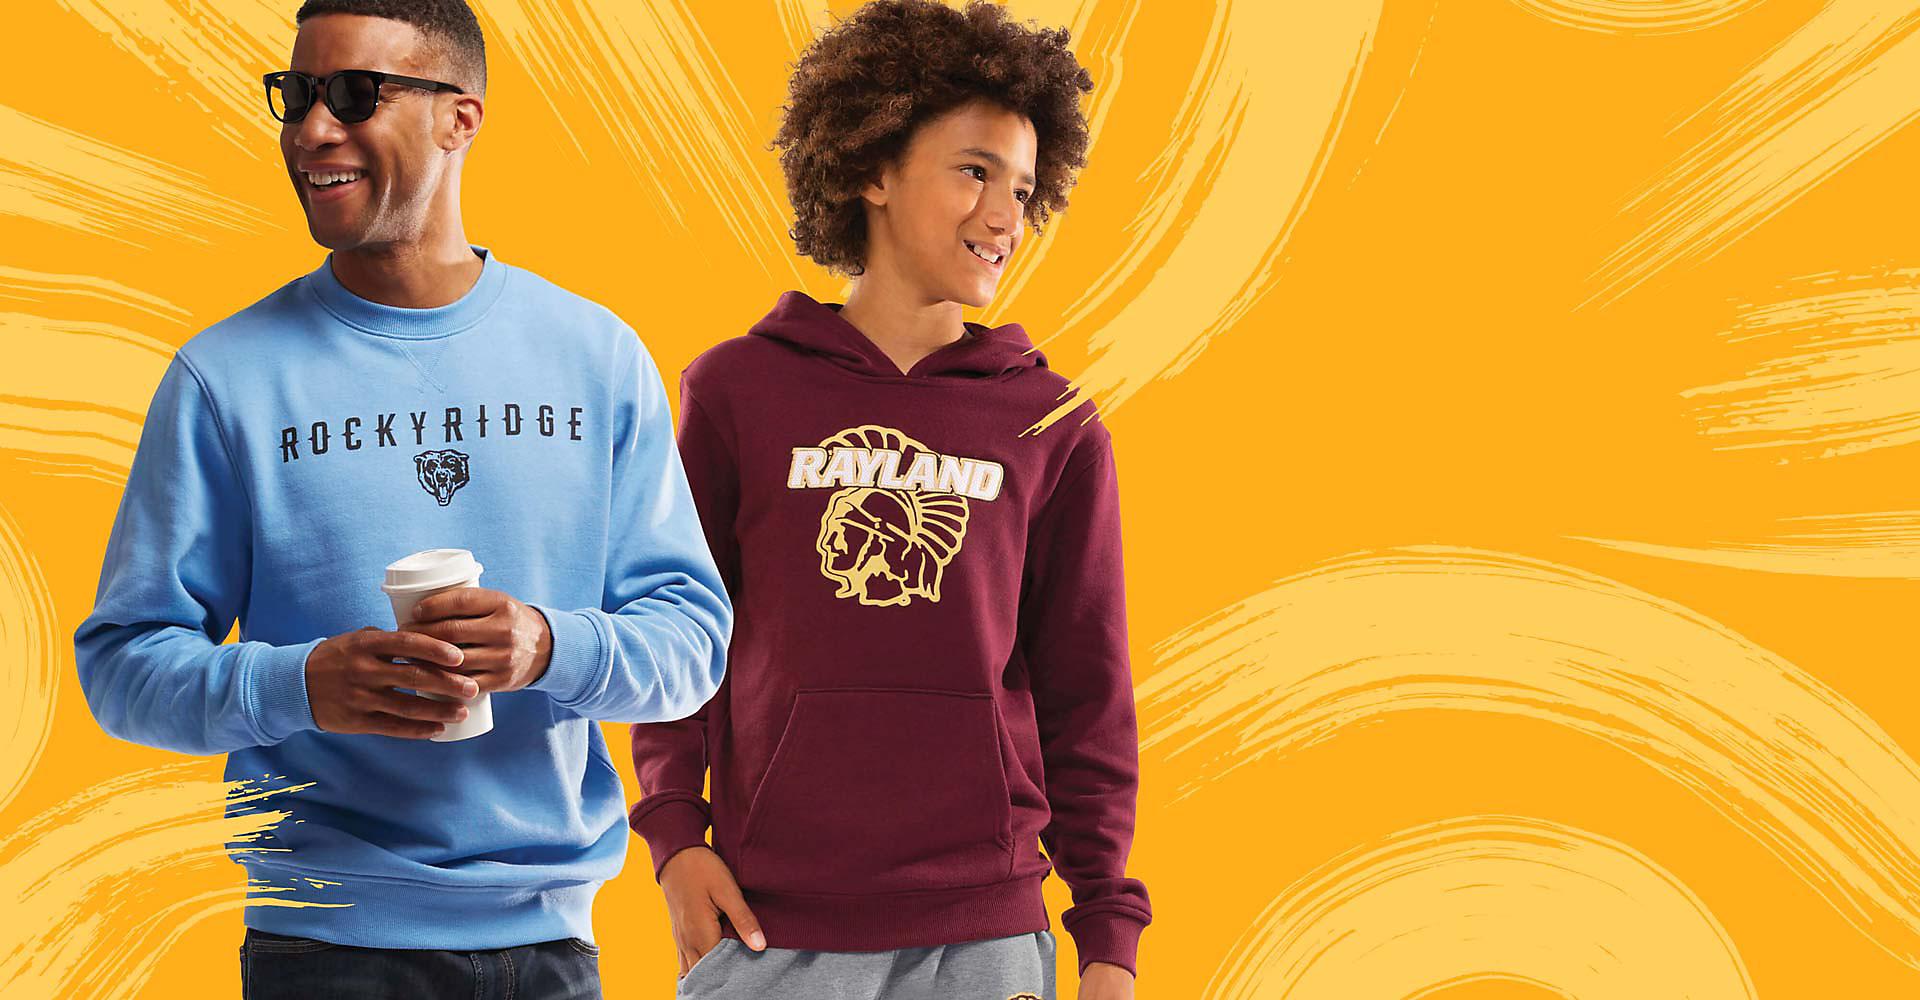 759243b3325d Wholesale Sports Apparel & Bulk Team Clothing   Augusta Sportswear,  Holloway, High Five, & Russell Athletic